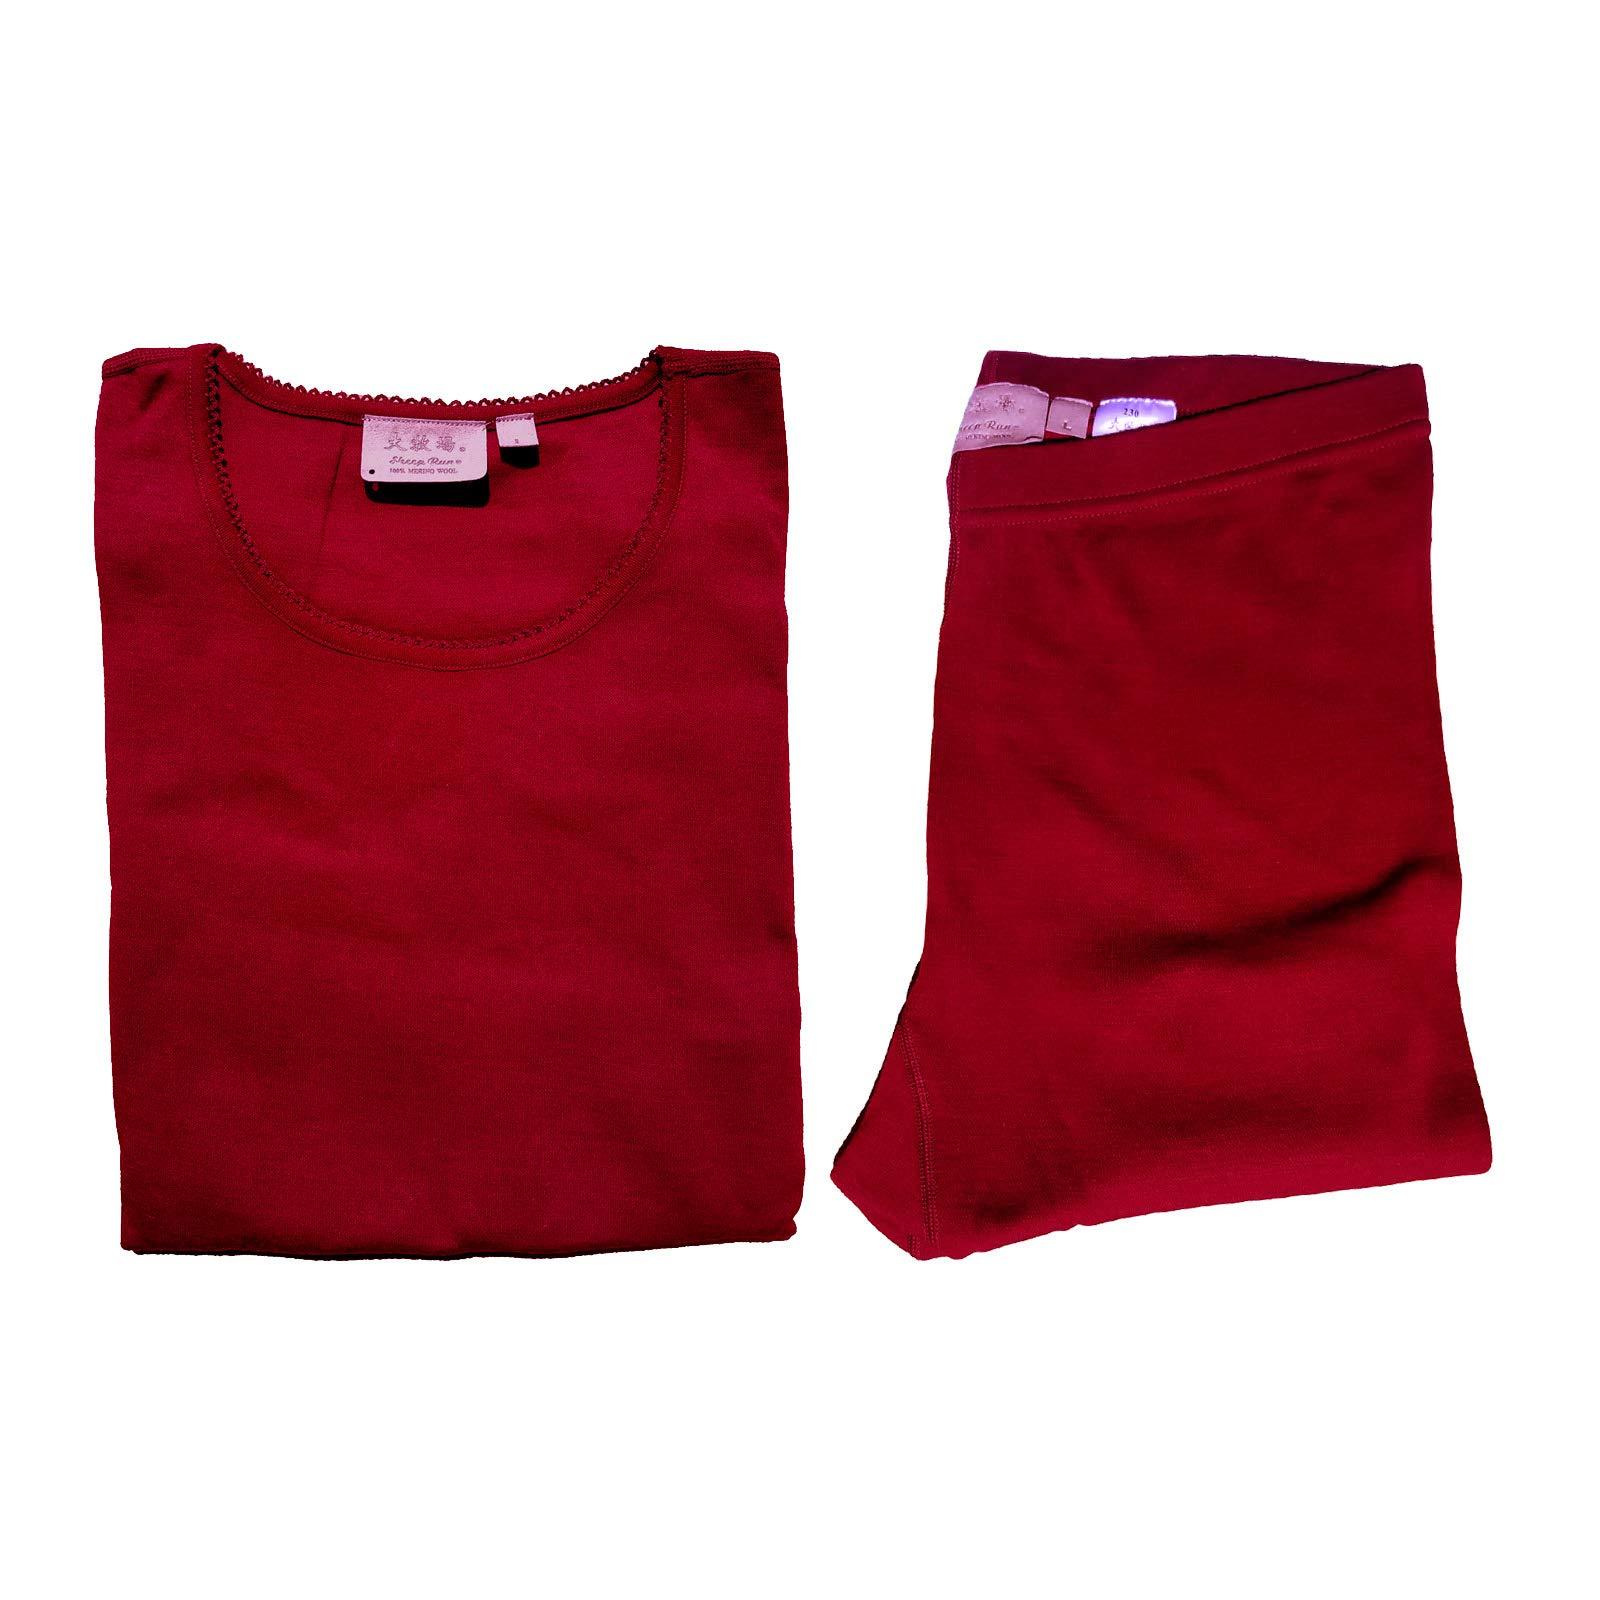 Sheep Run Womens 100% Merino Wool Thermal Underwear Top and Pants (Red, Small) by Sheep Run